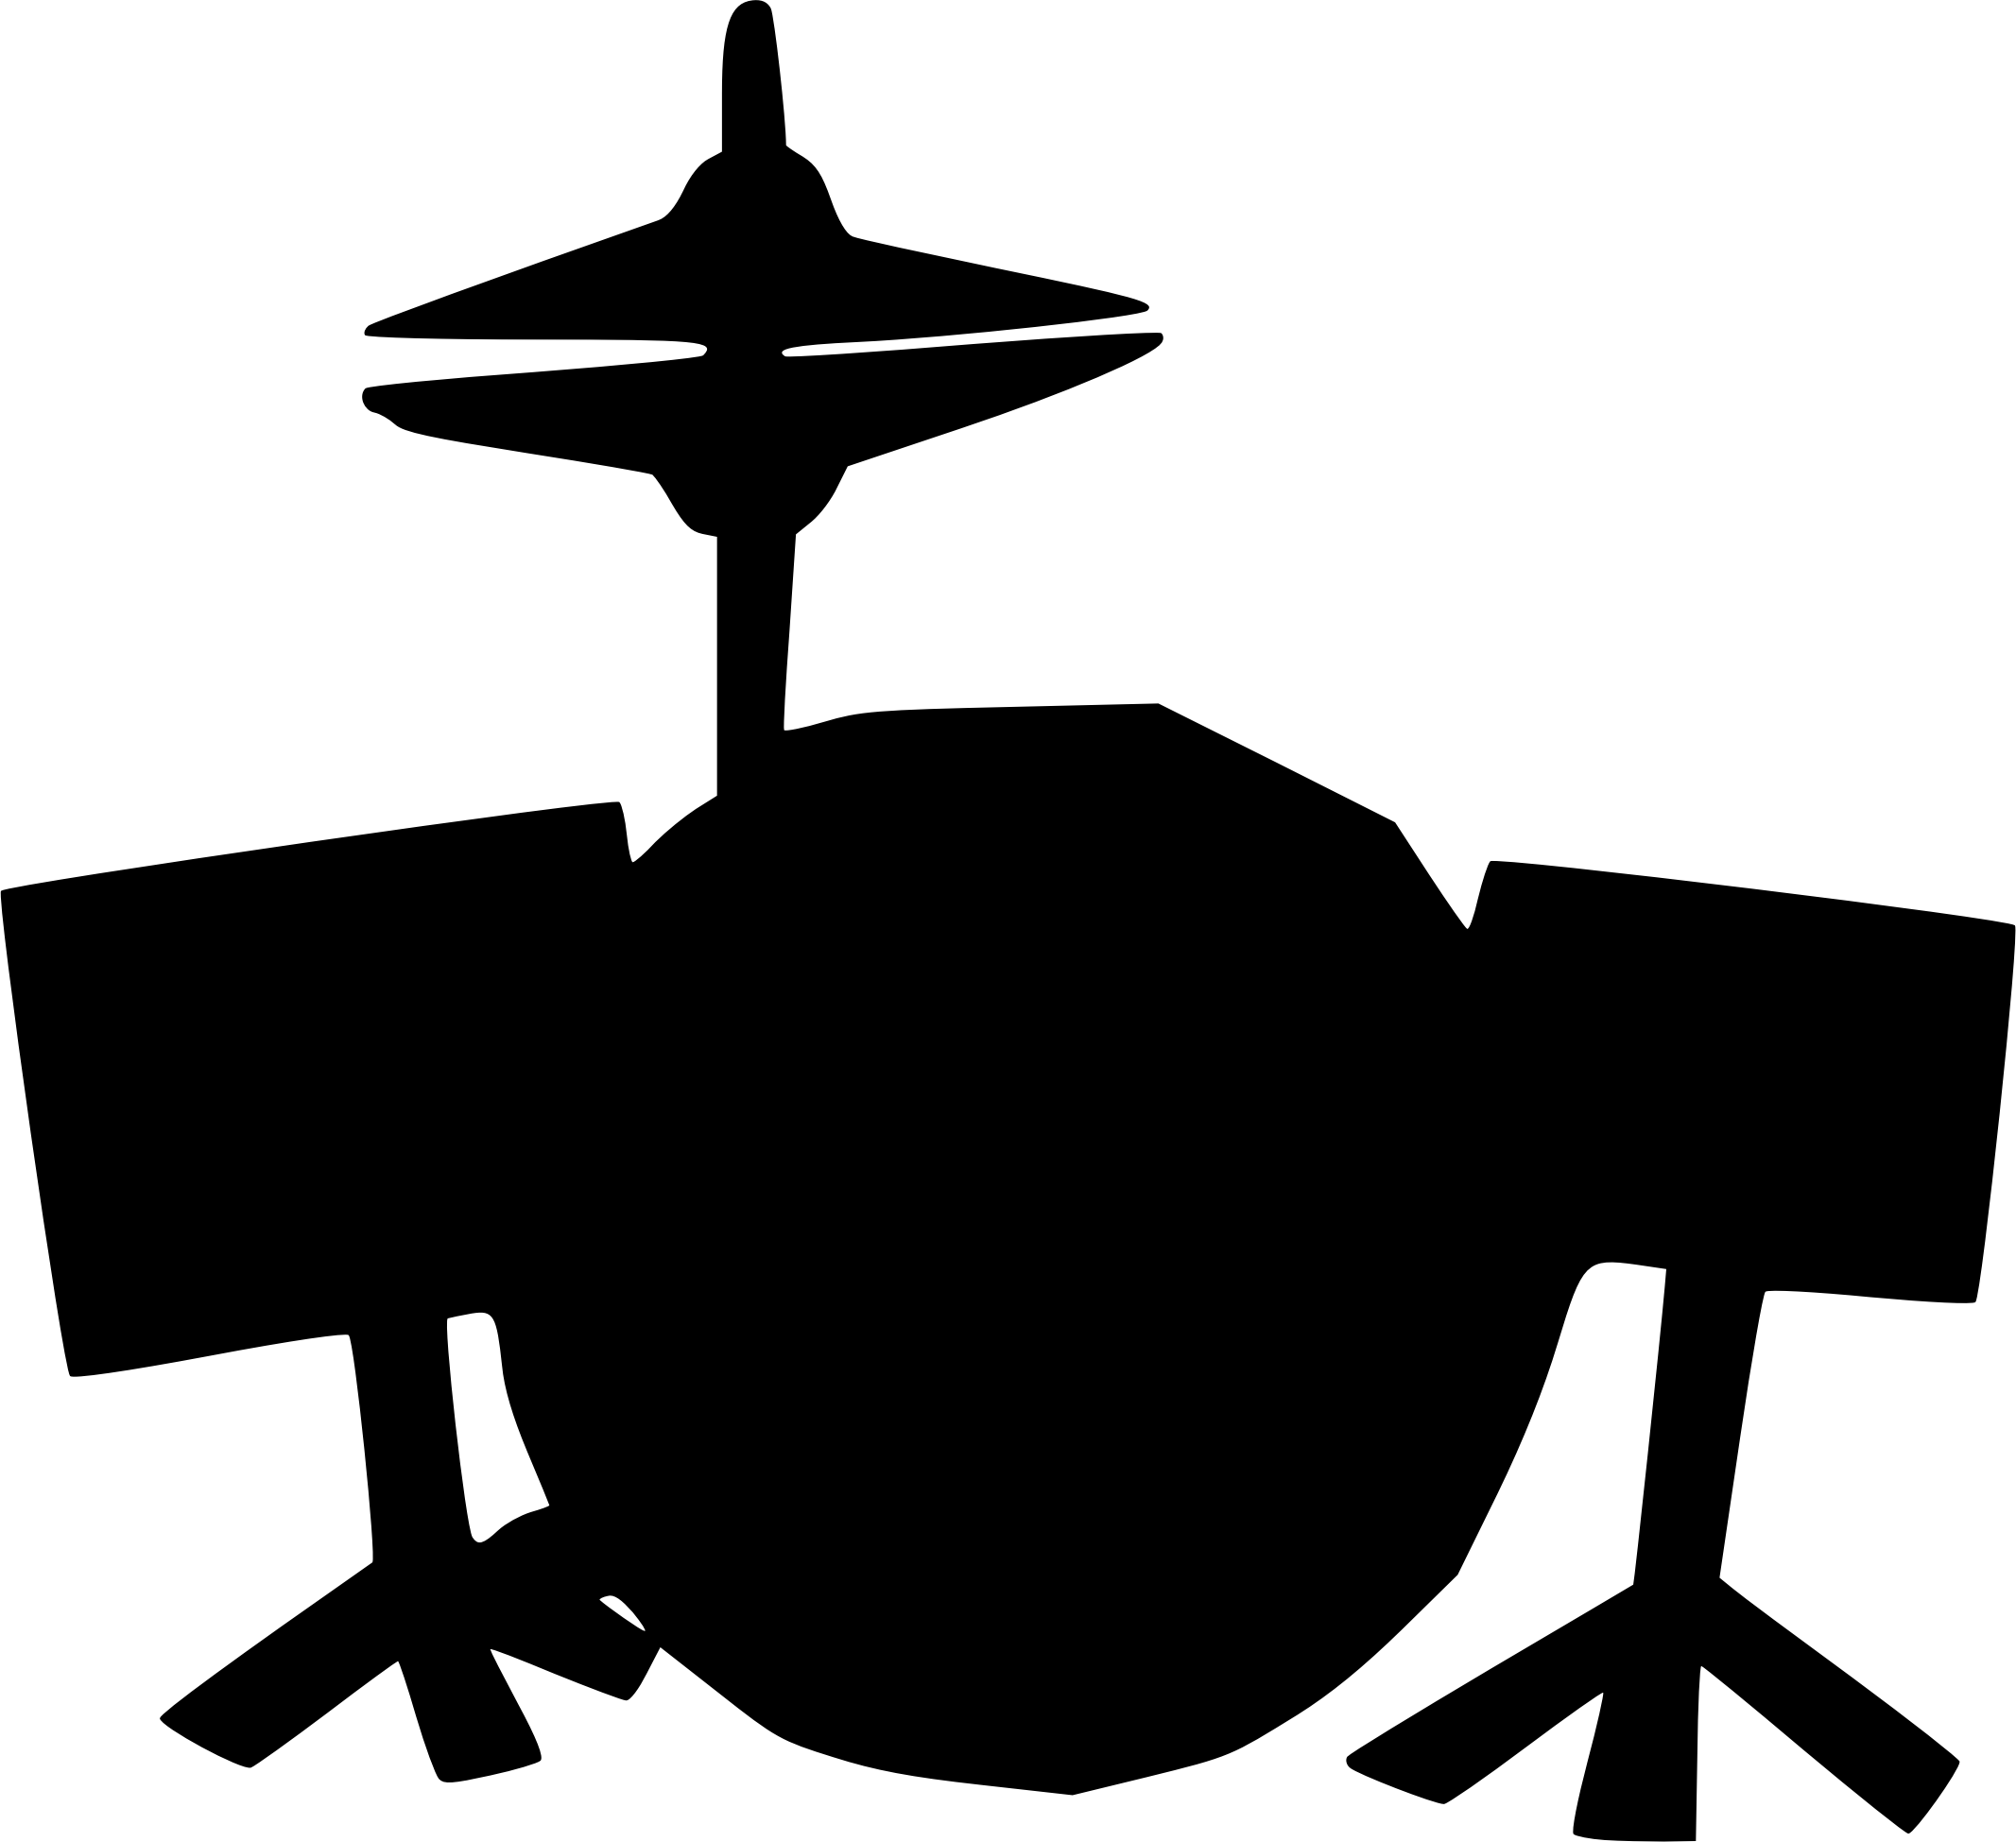 2133x1949 Clipart